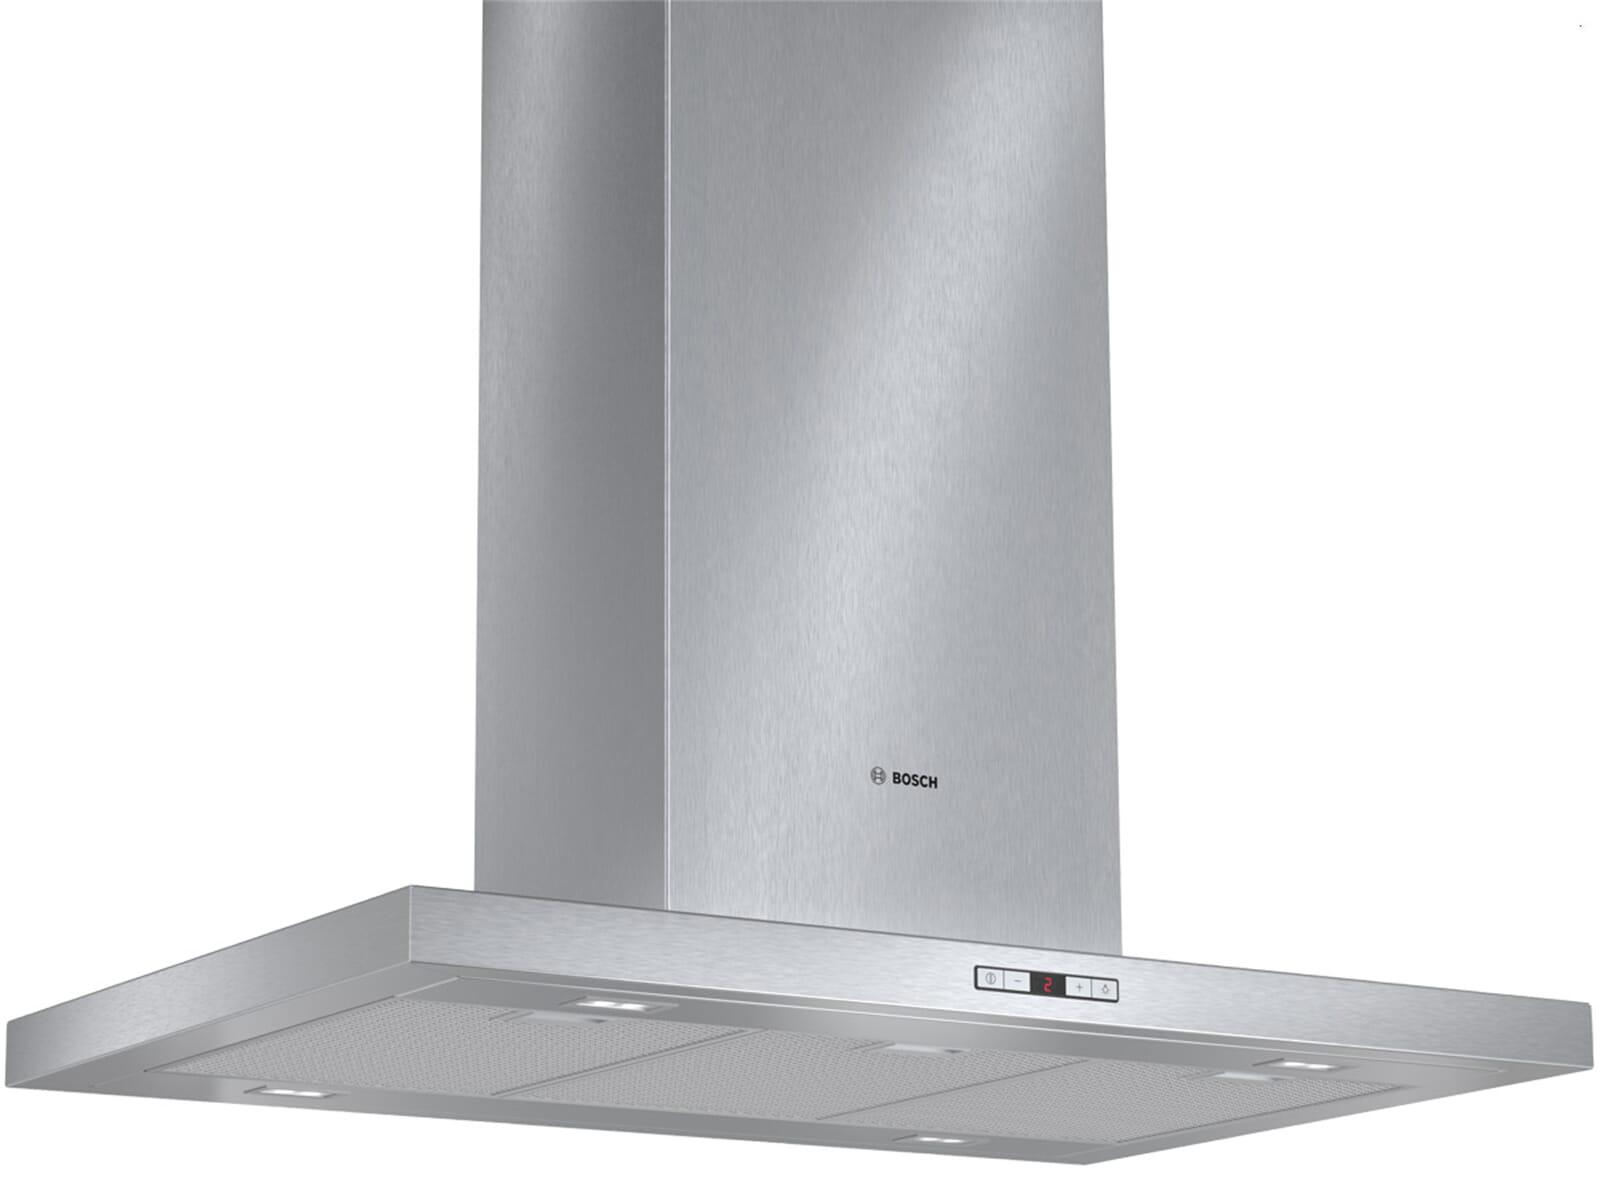 Bosch Kühlschrank Wasserfilter Wechseln : Bosch kühlschrank filter wechseln: daewoo wasserfilter dd ab u ac